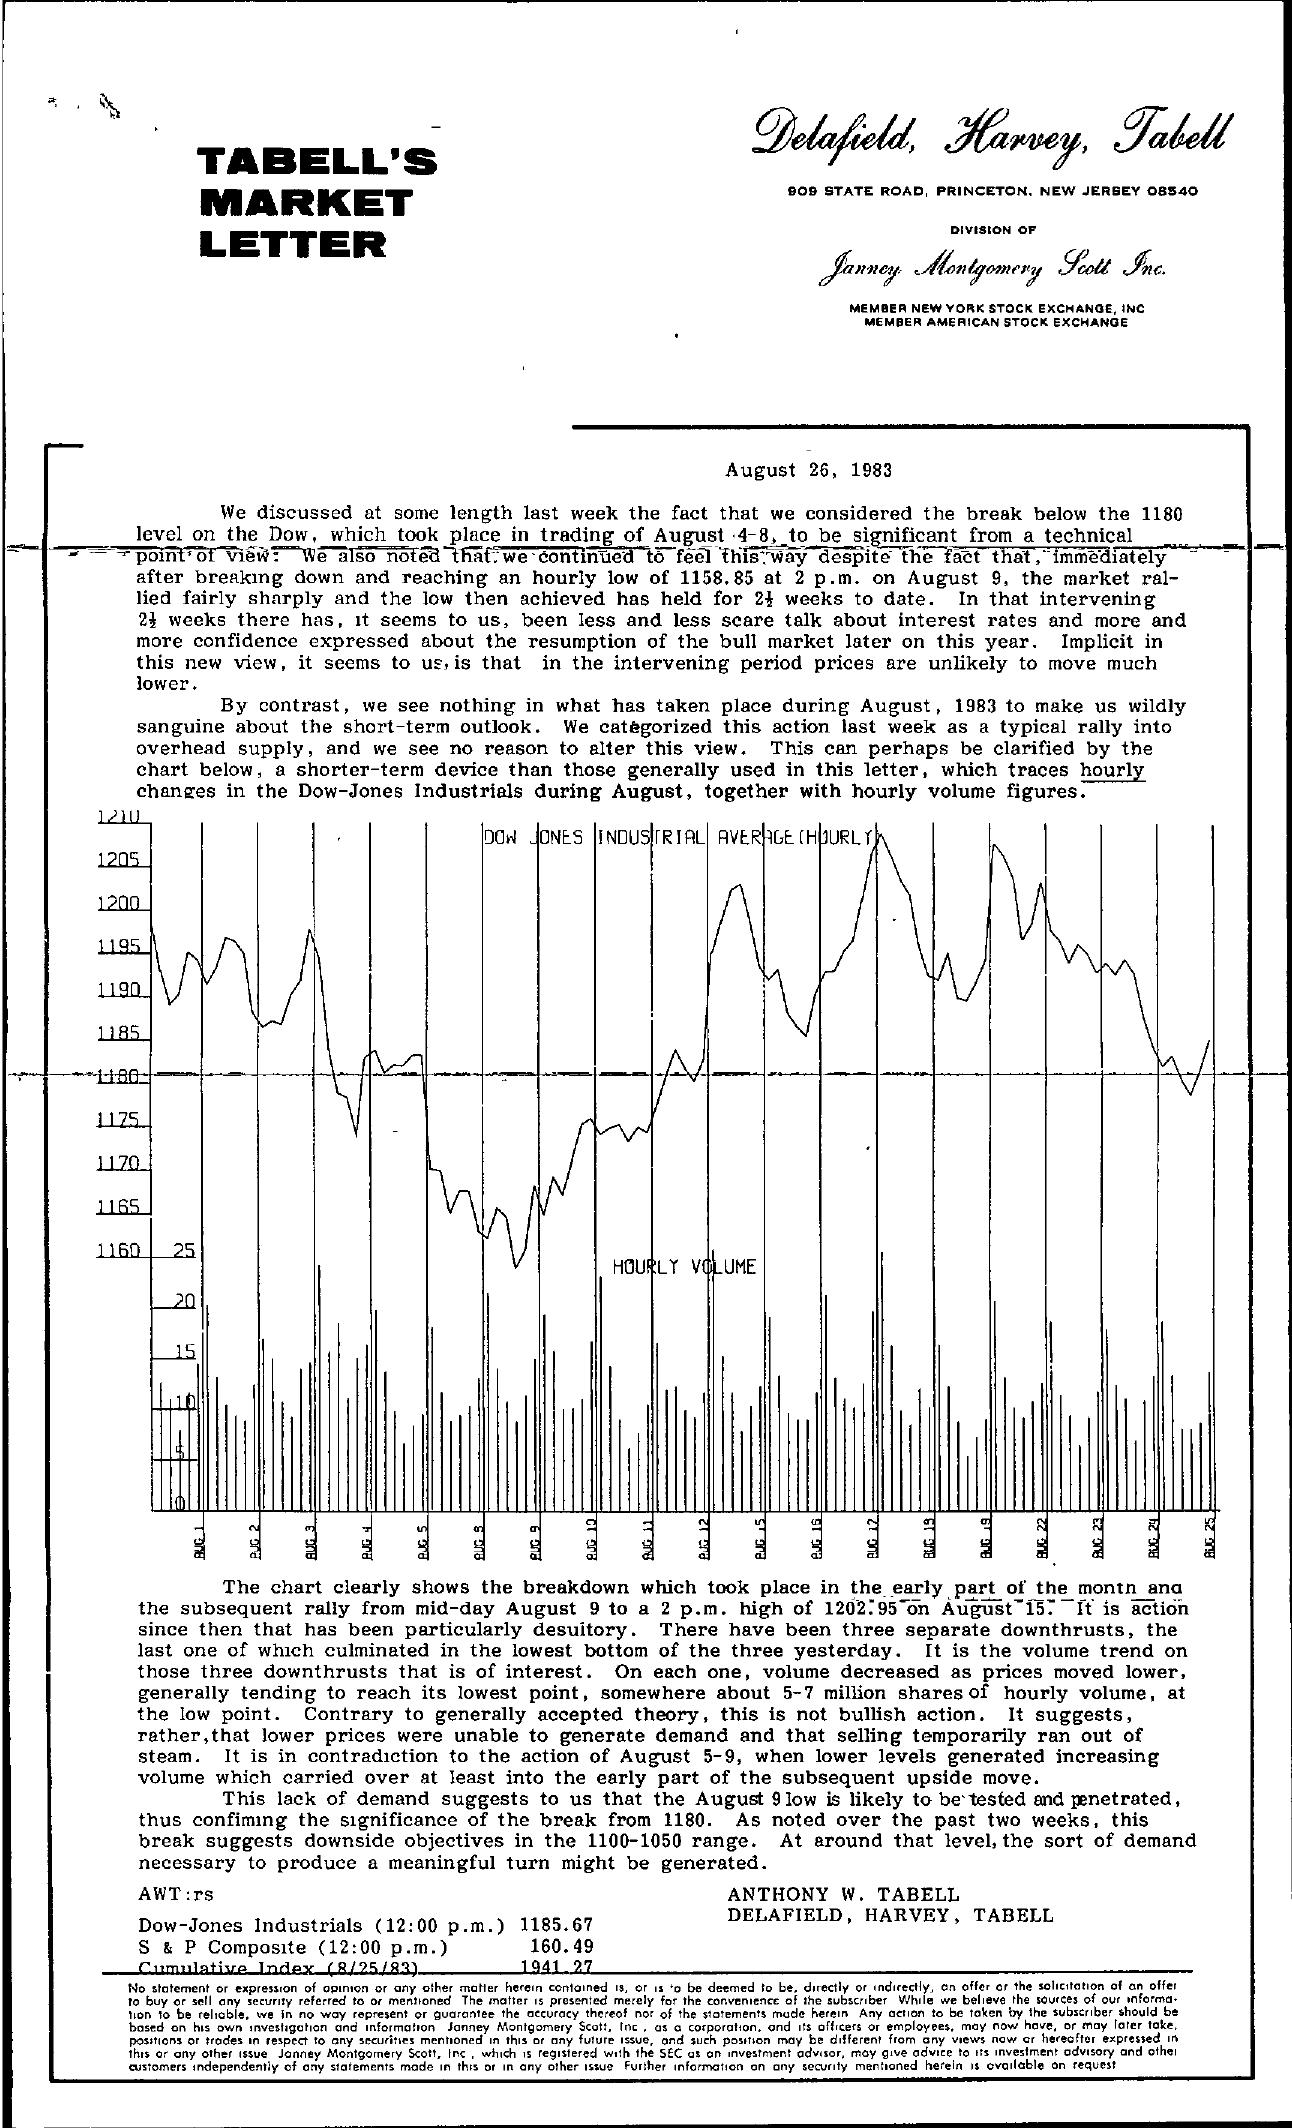 Tabell's Market Letter - August 26, 1983